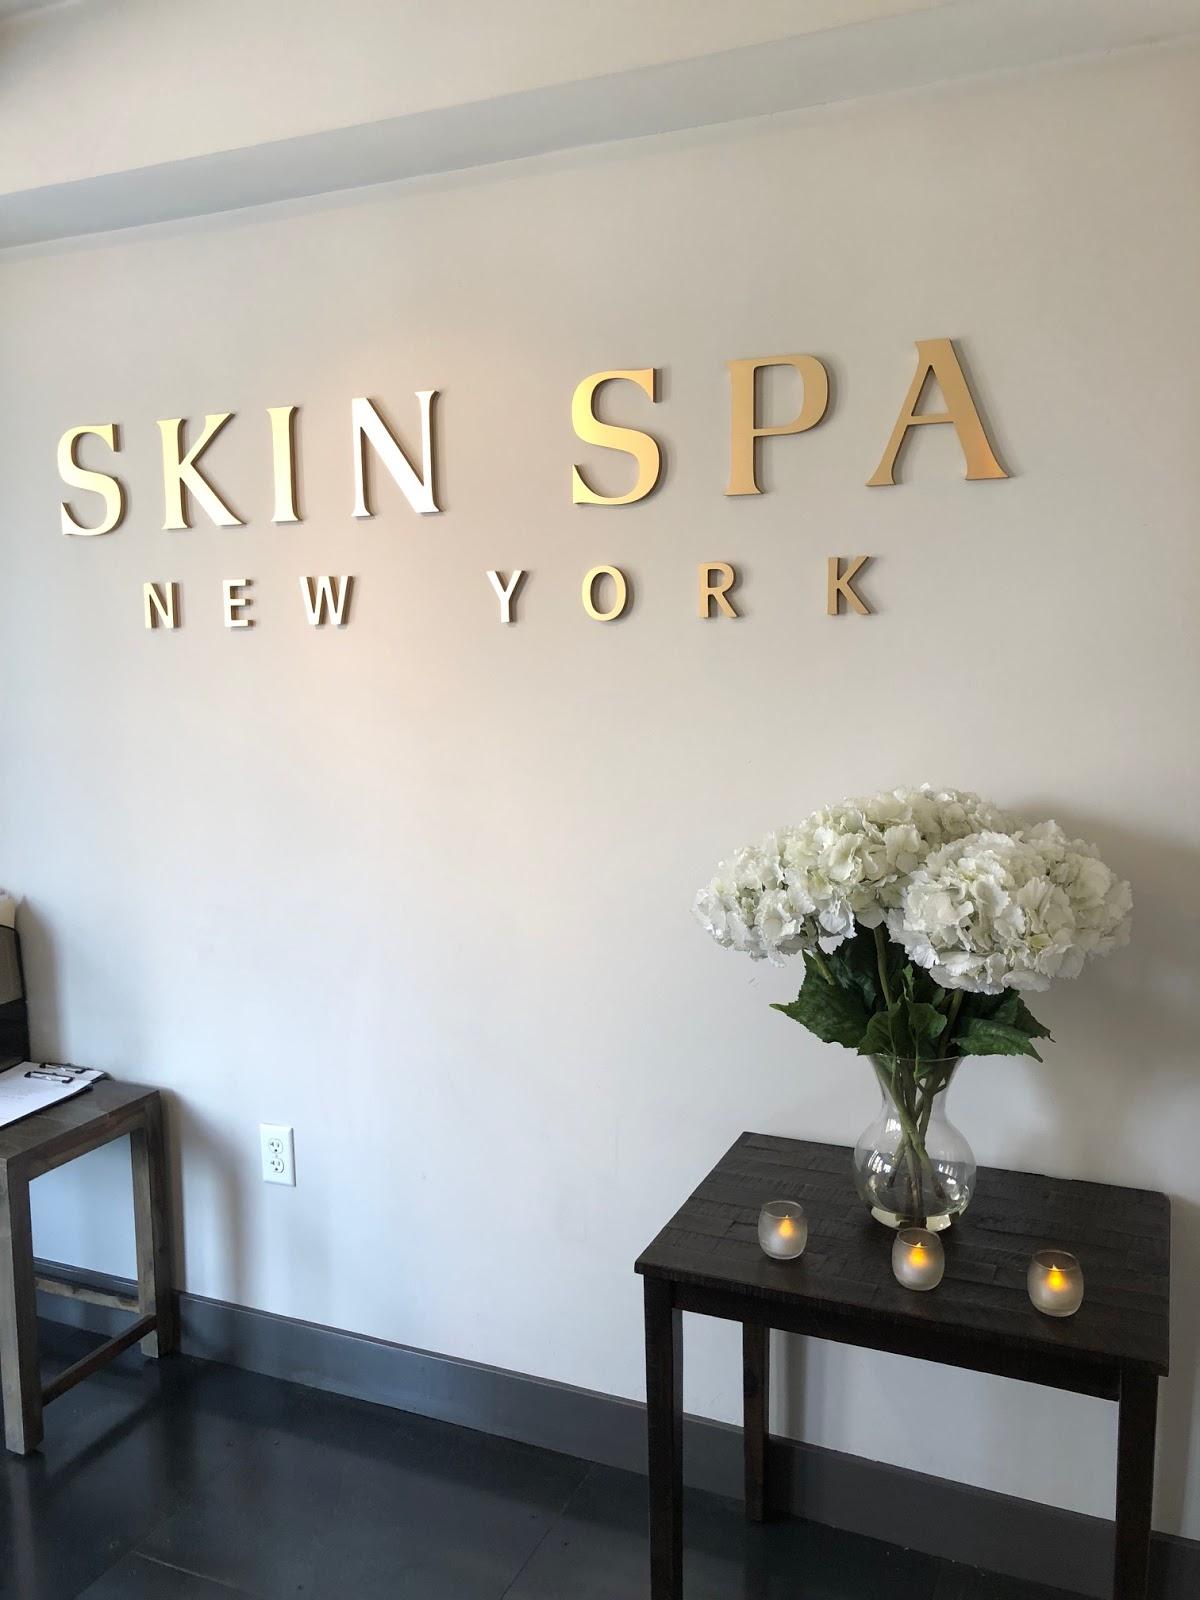 skin-spa-new-york-spray-tan-newbury-street-boston